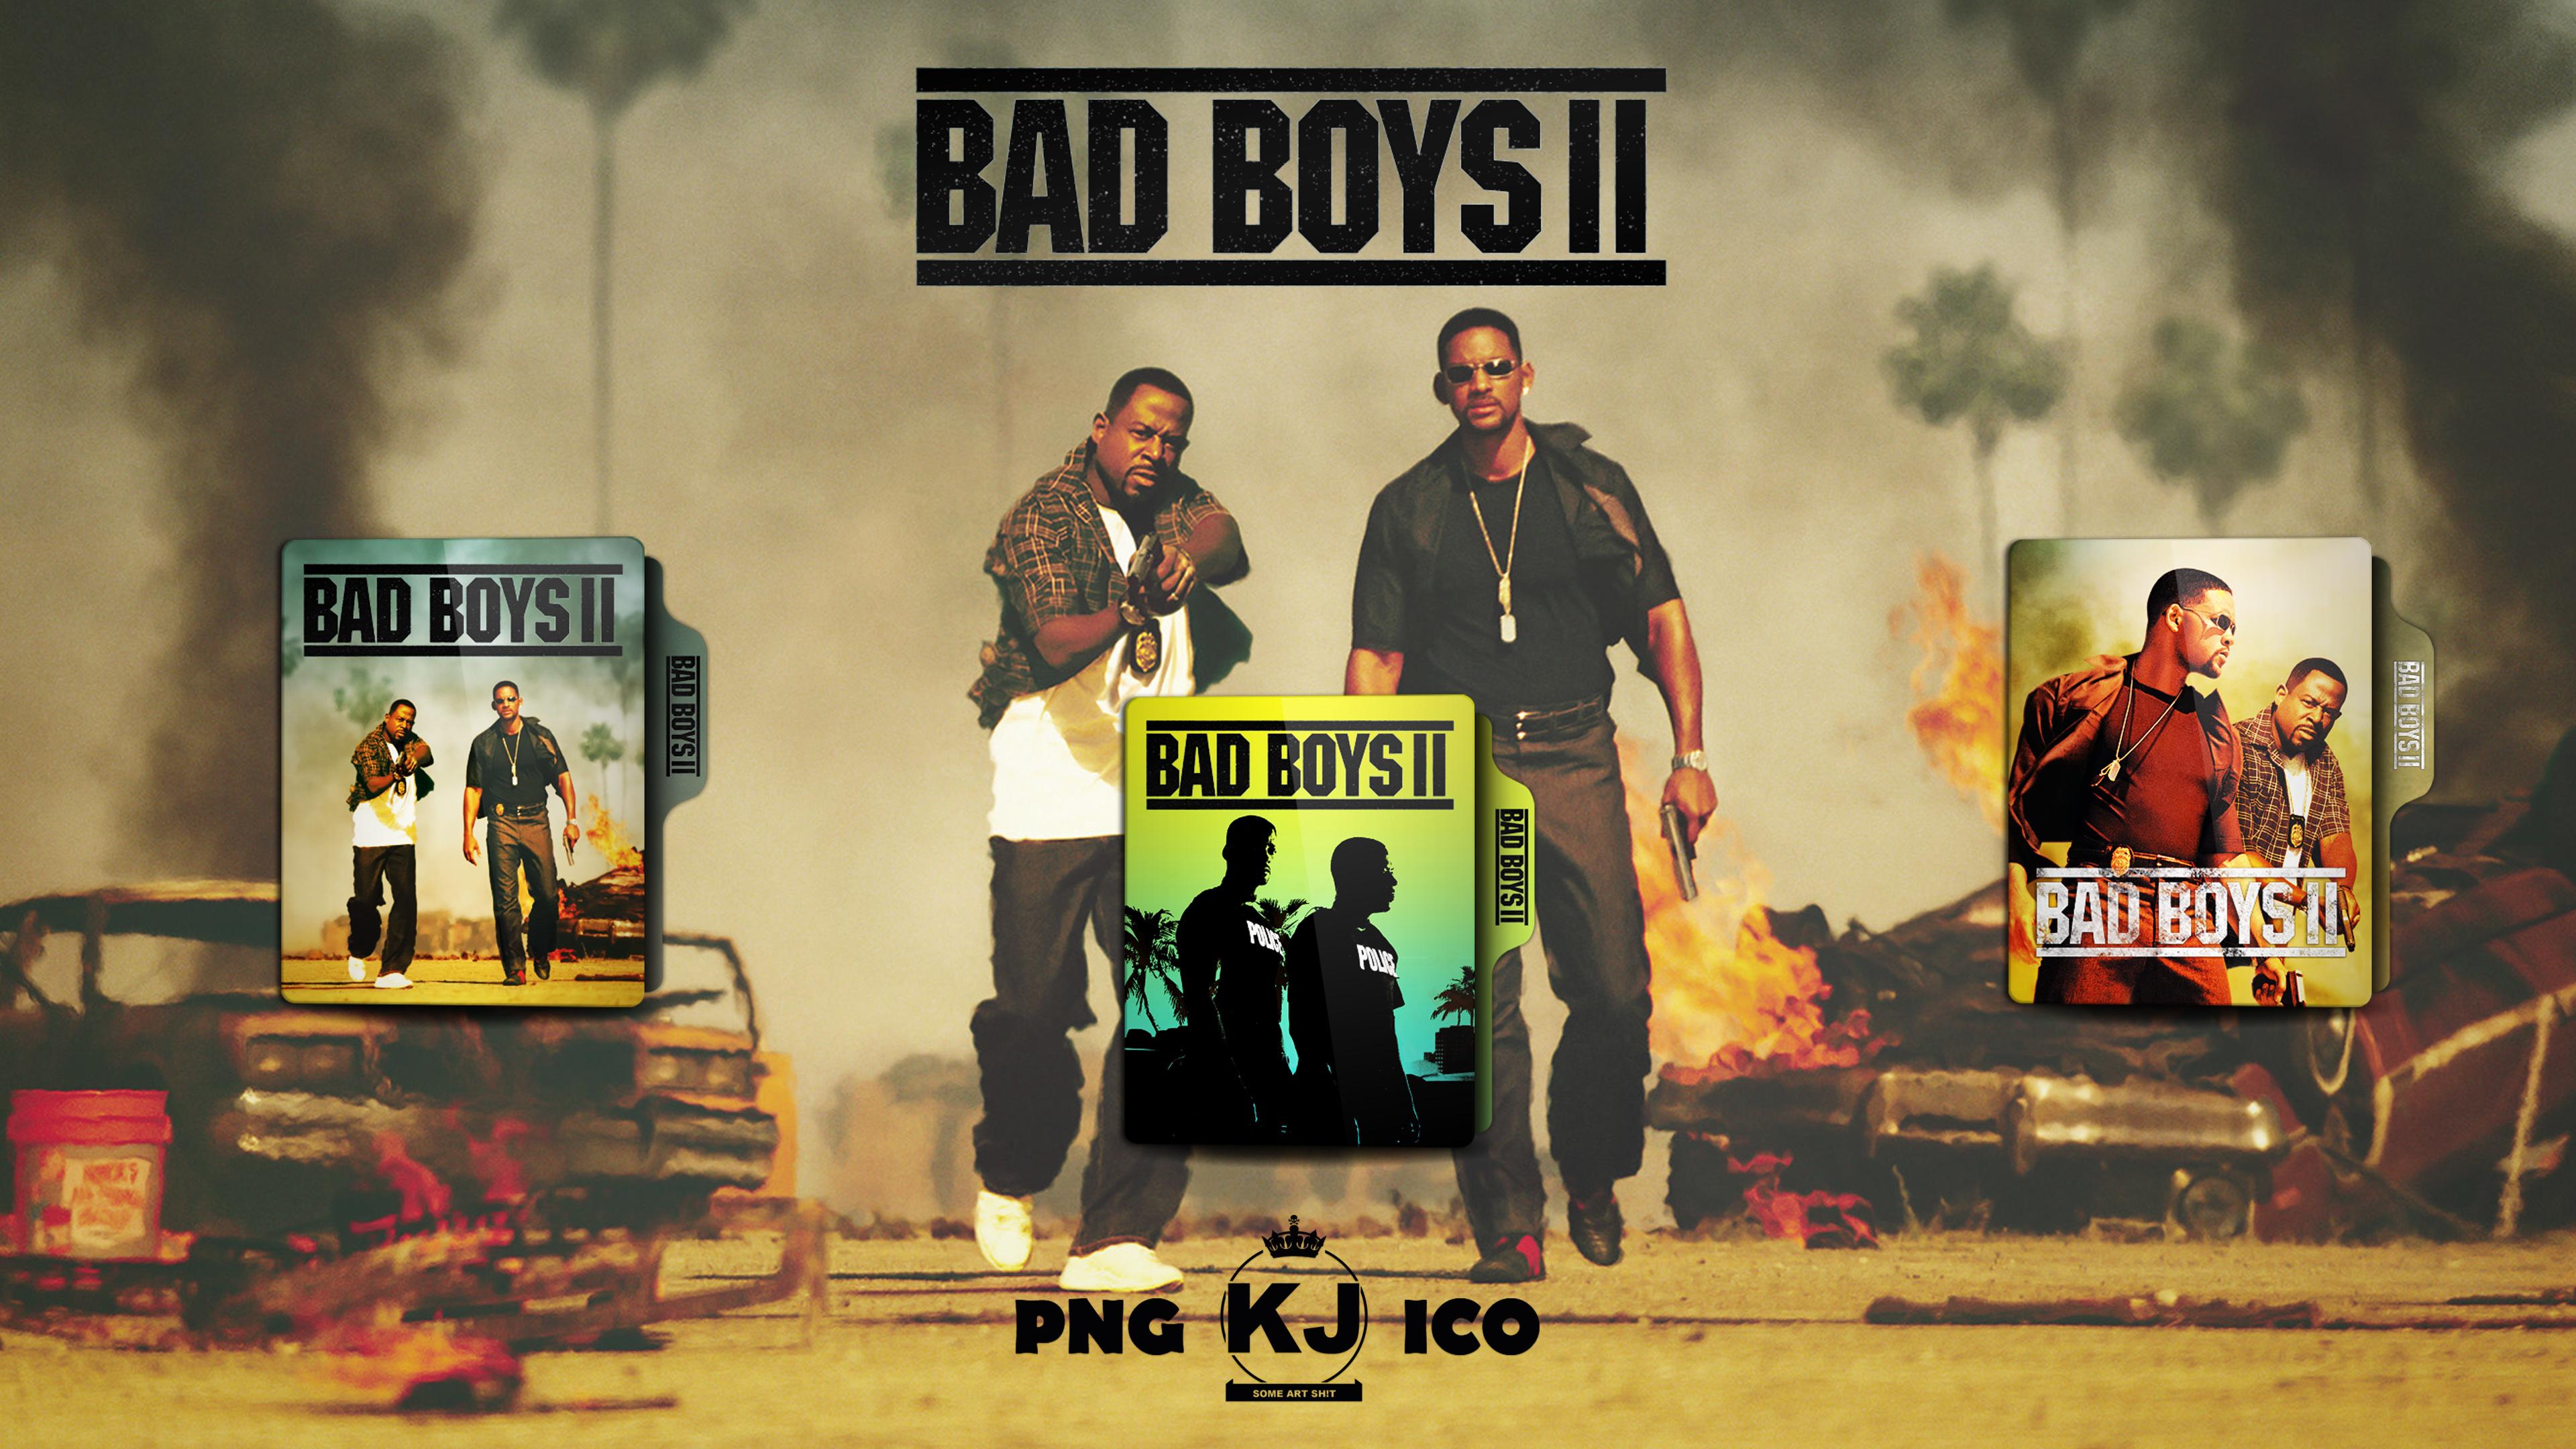 Bad Boys Ii 2003 Folder Icon By Kingjoe93 On Deviantart